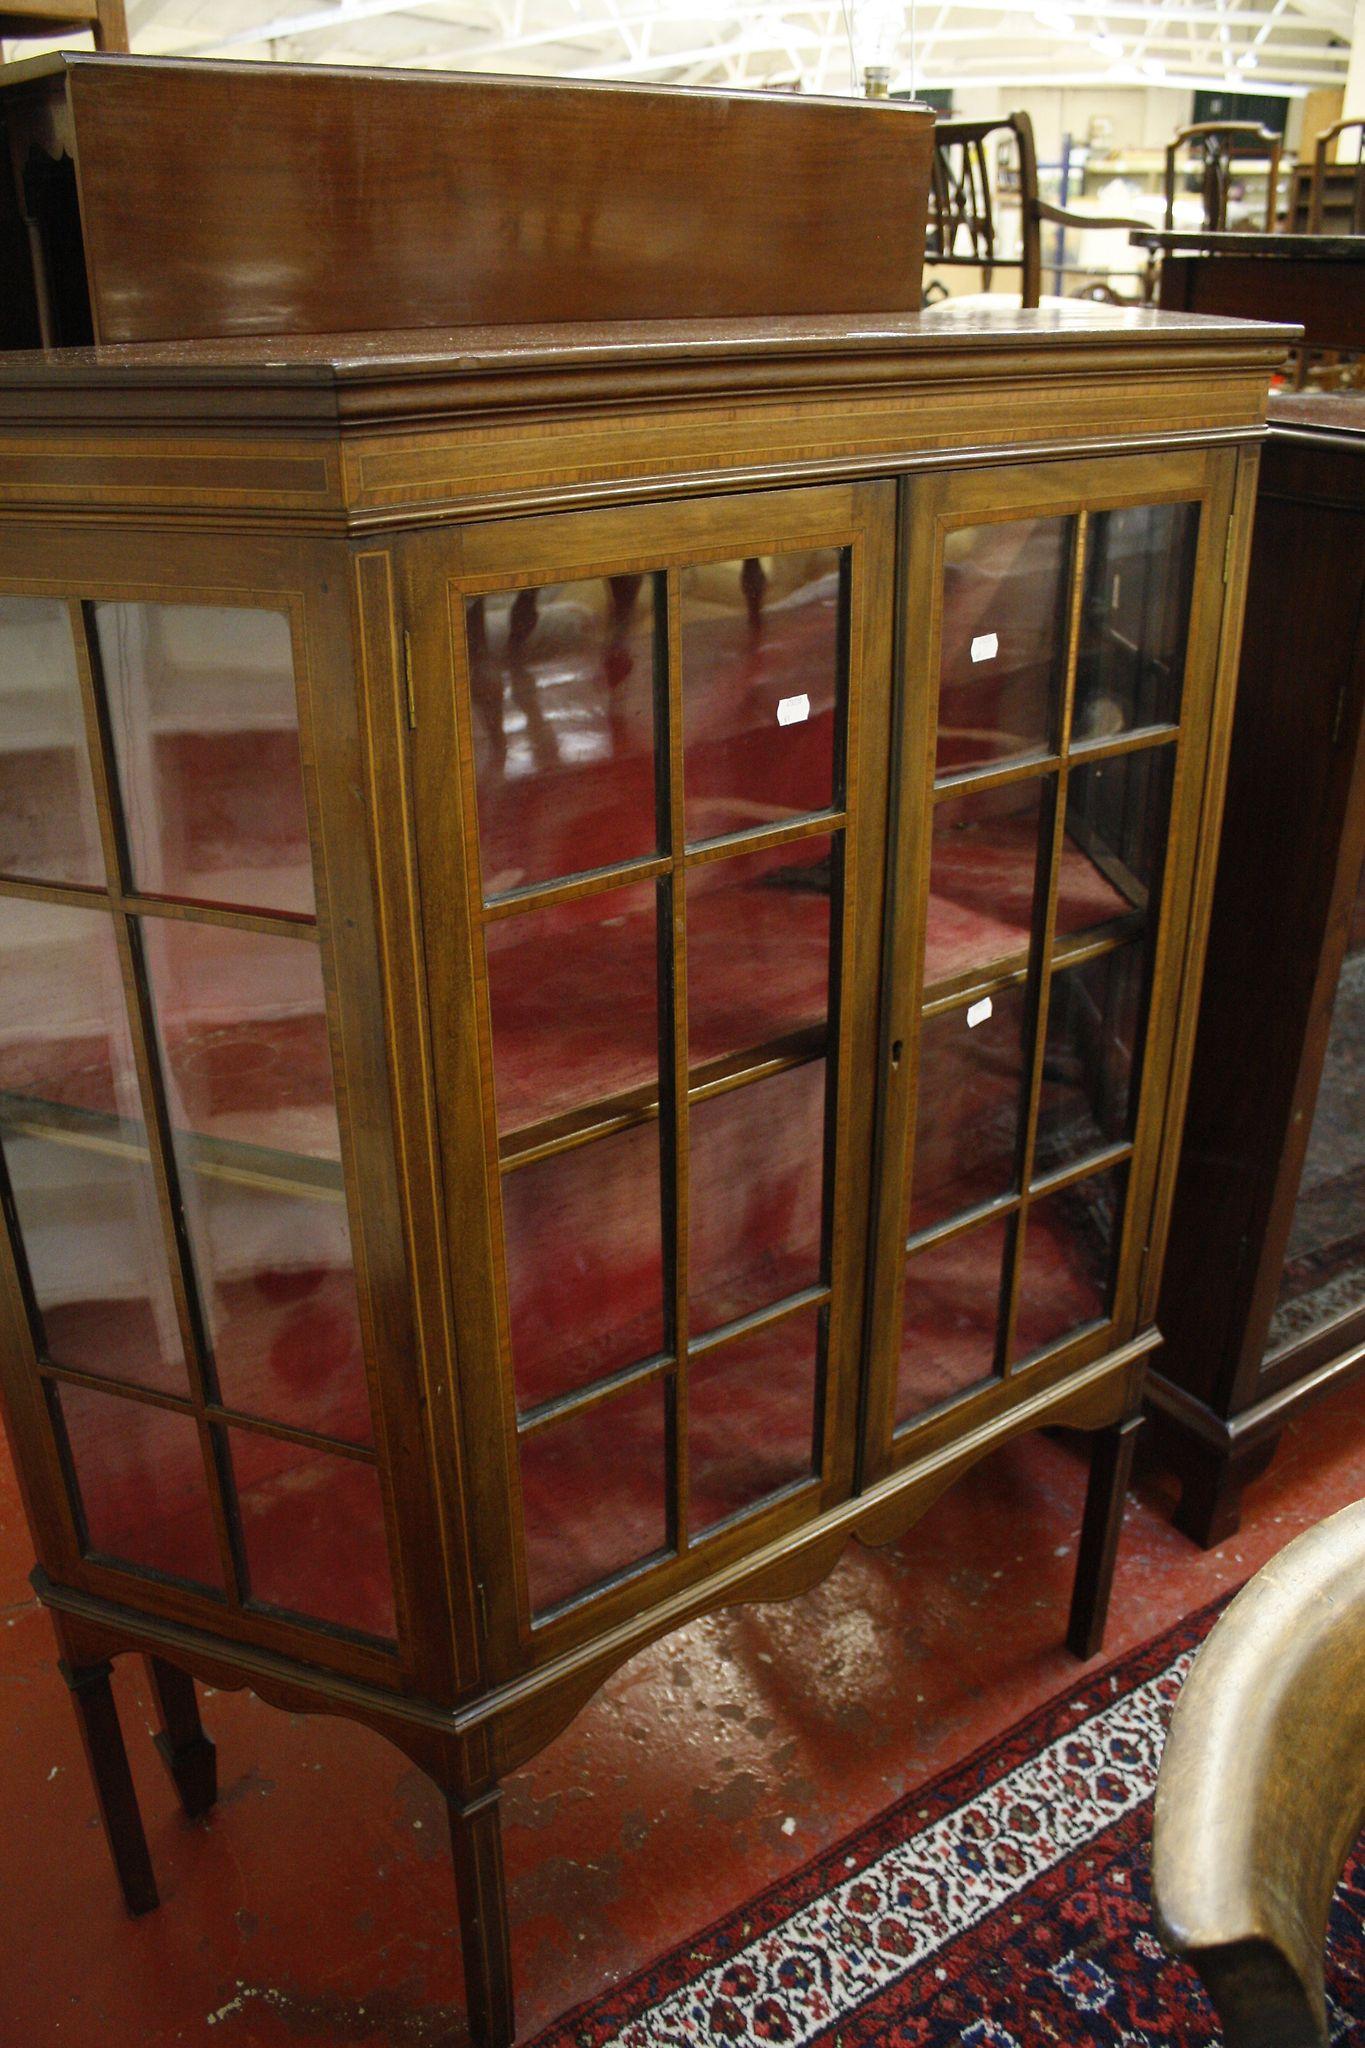 An Edwardian mahogany glazed china cabinet